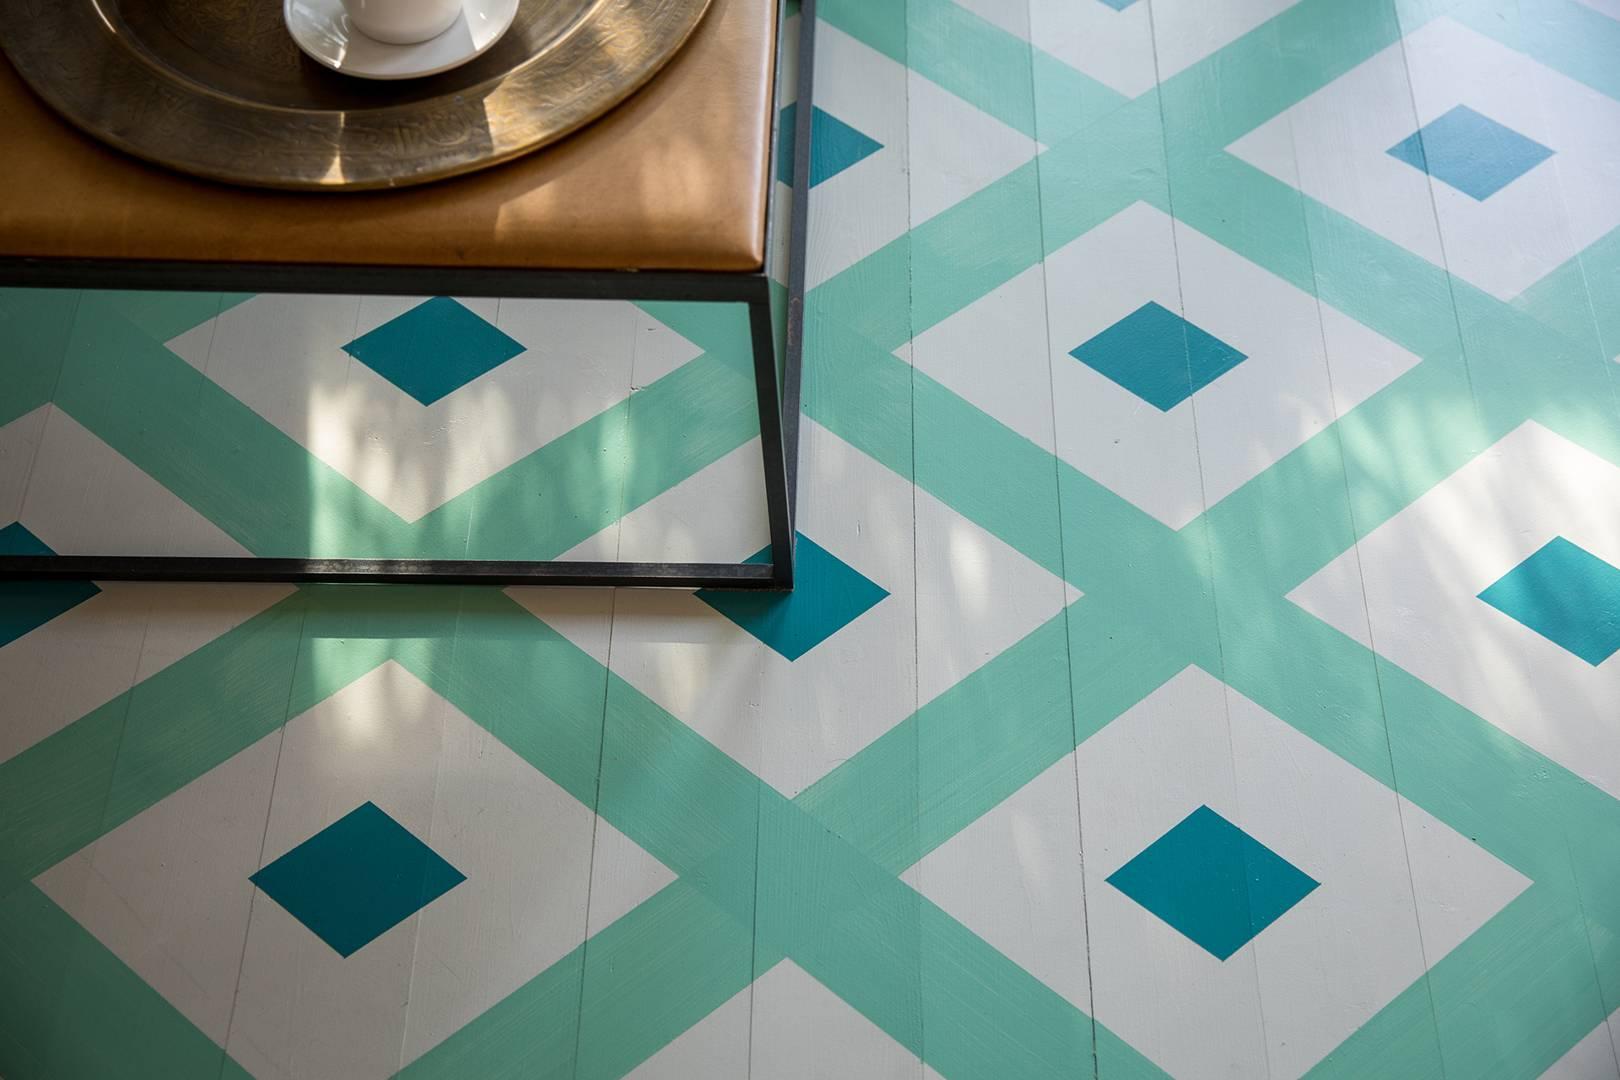 Geometric floor pattern – how to paint | House & Garden